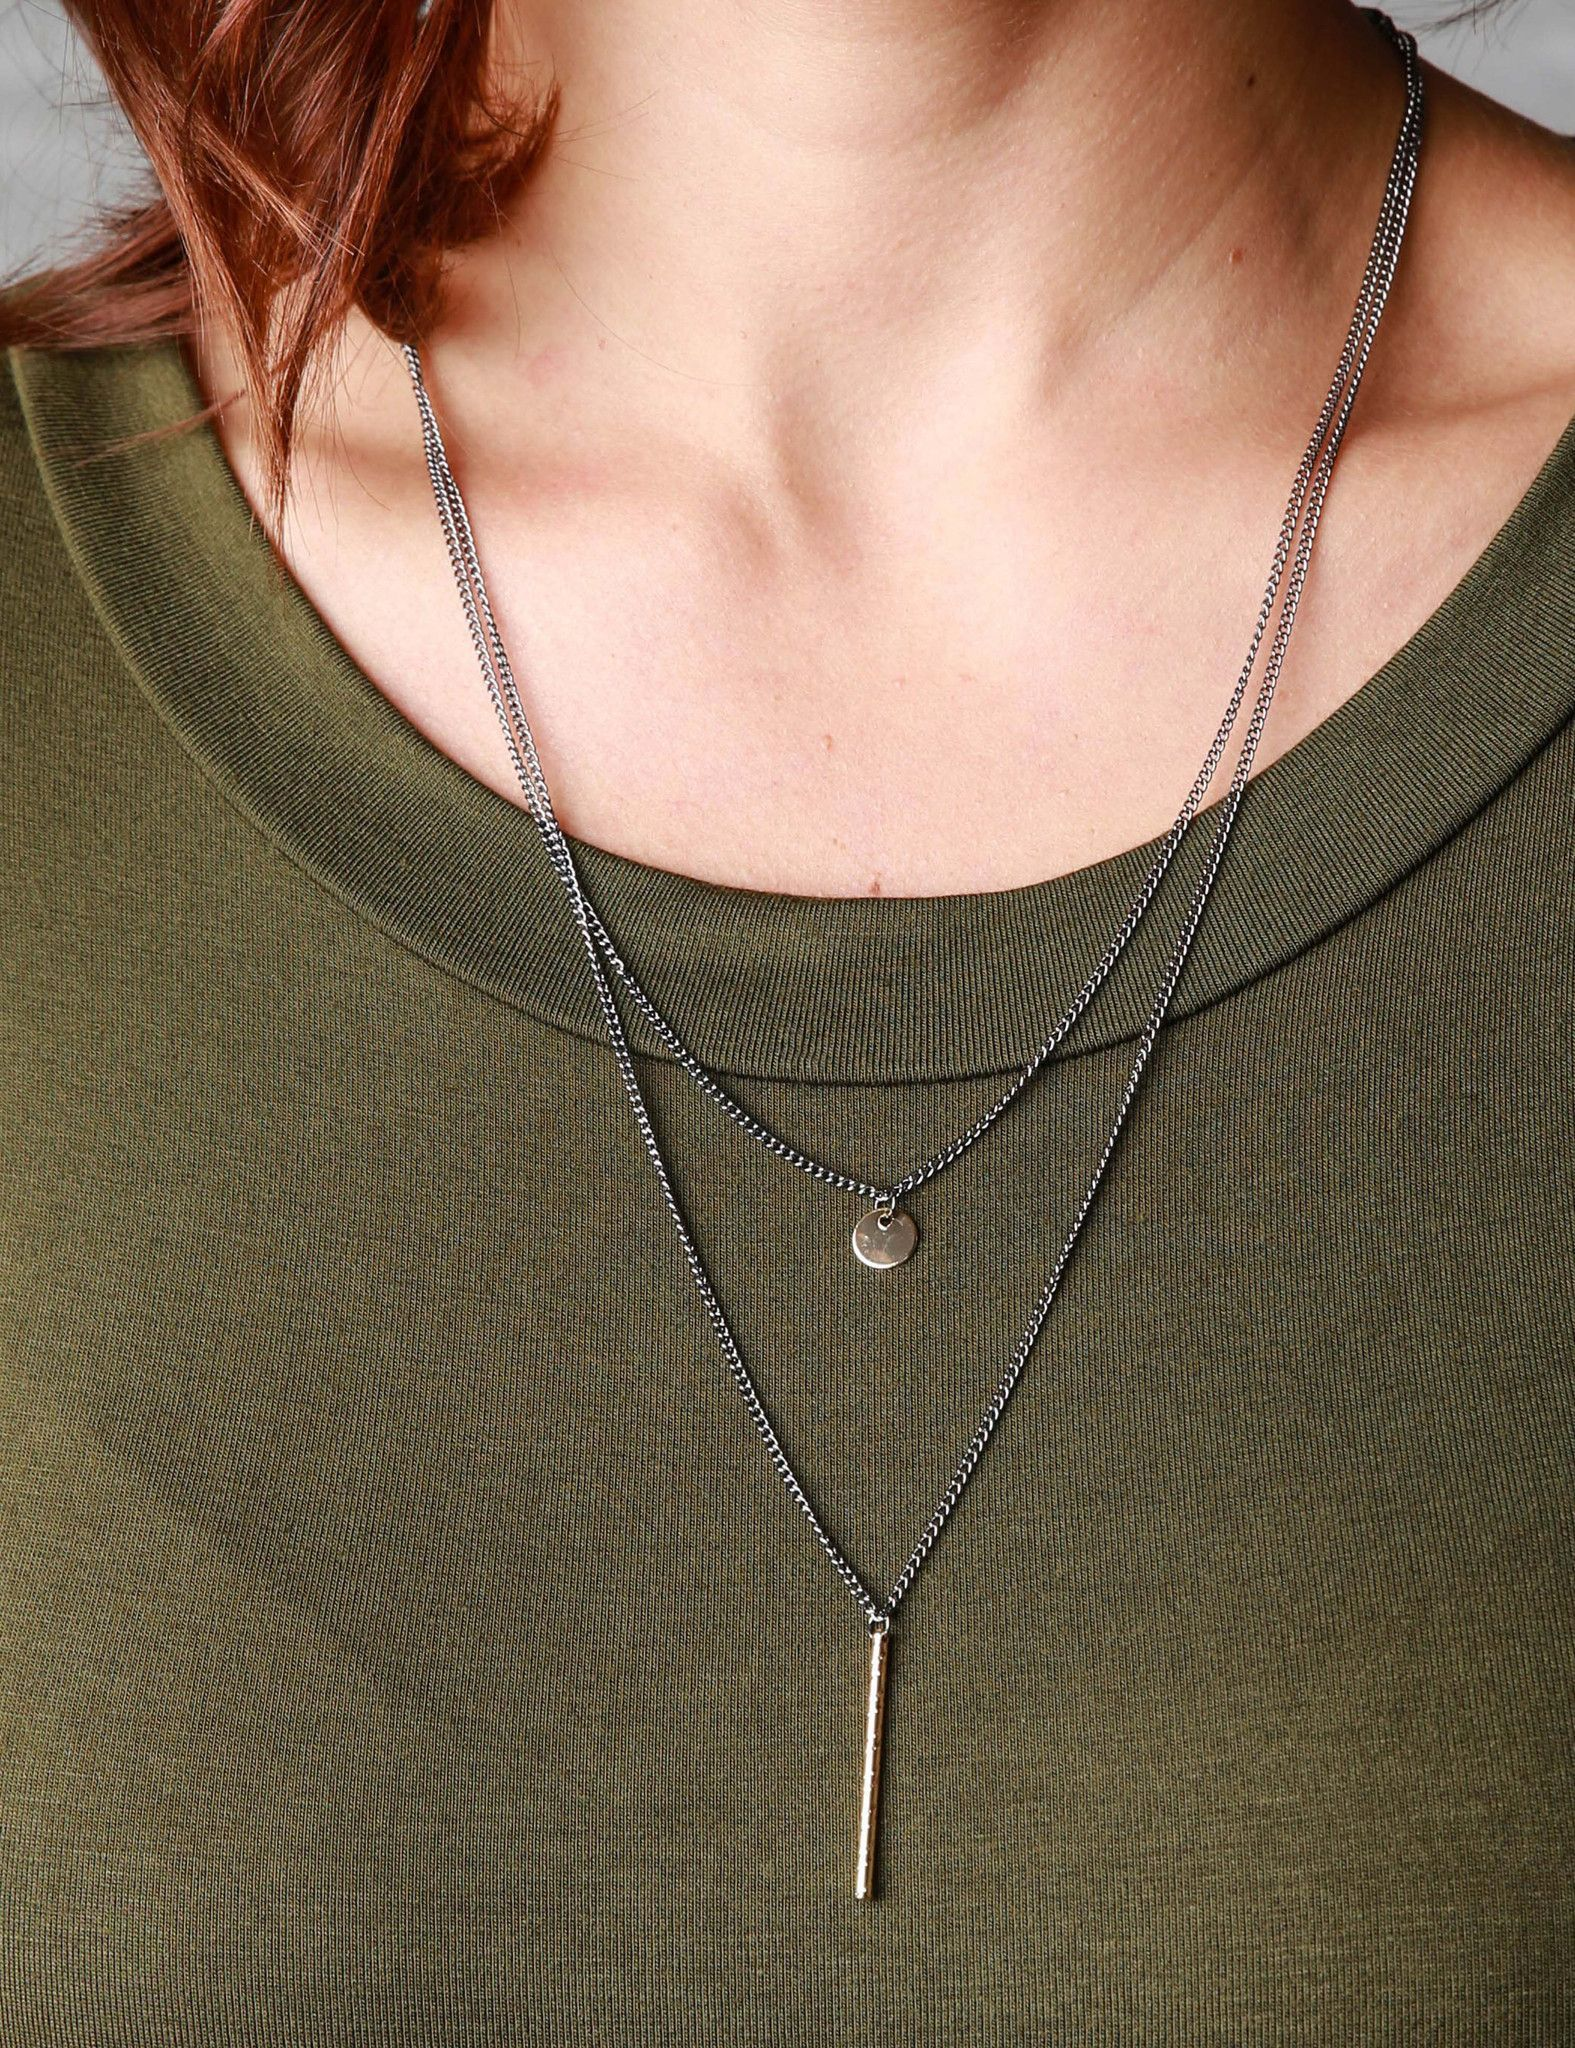 Sadie Bar and Dot Necklace